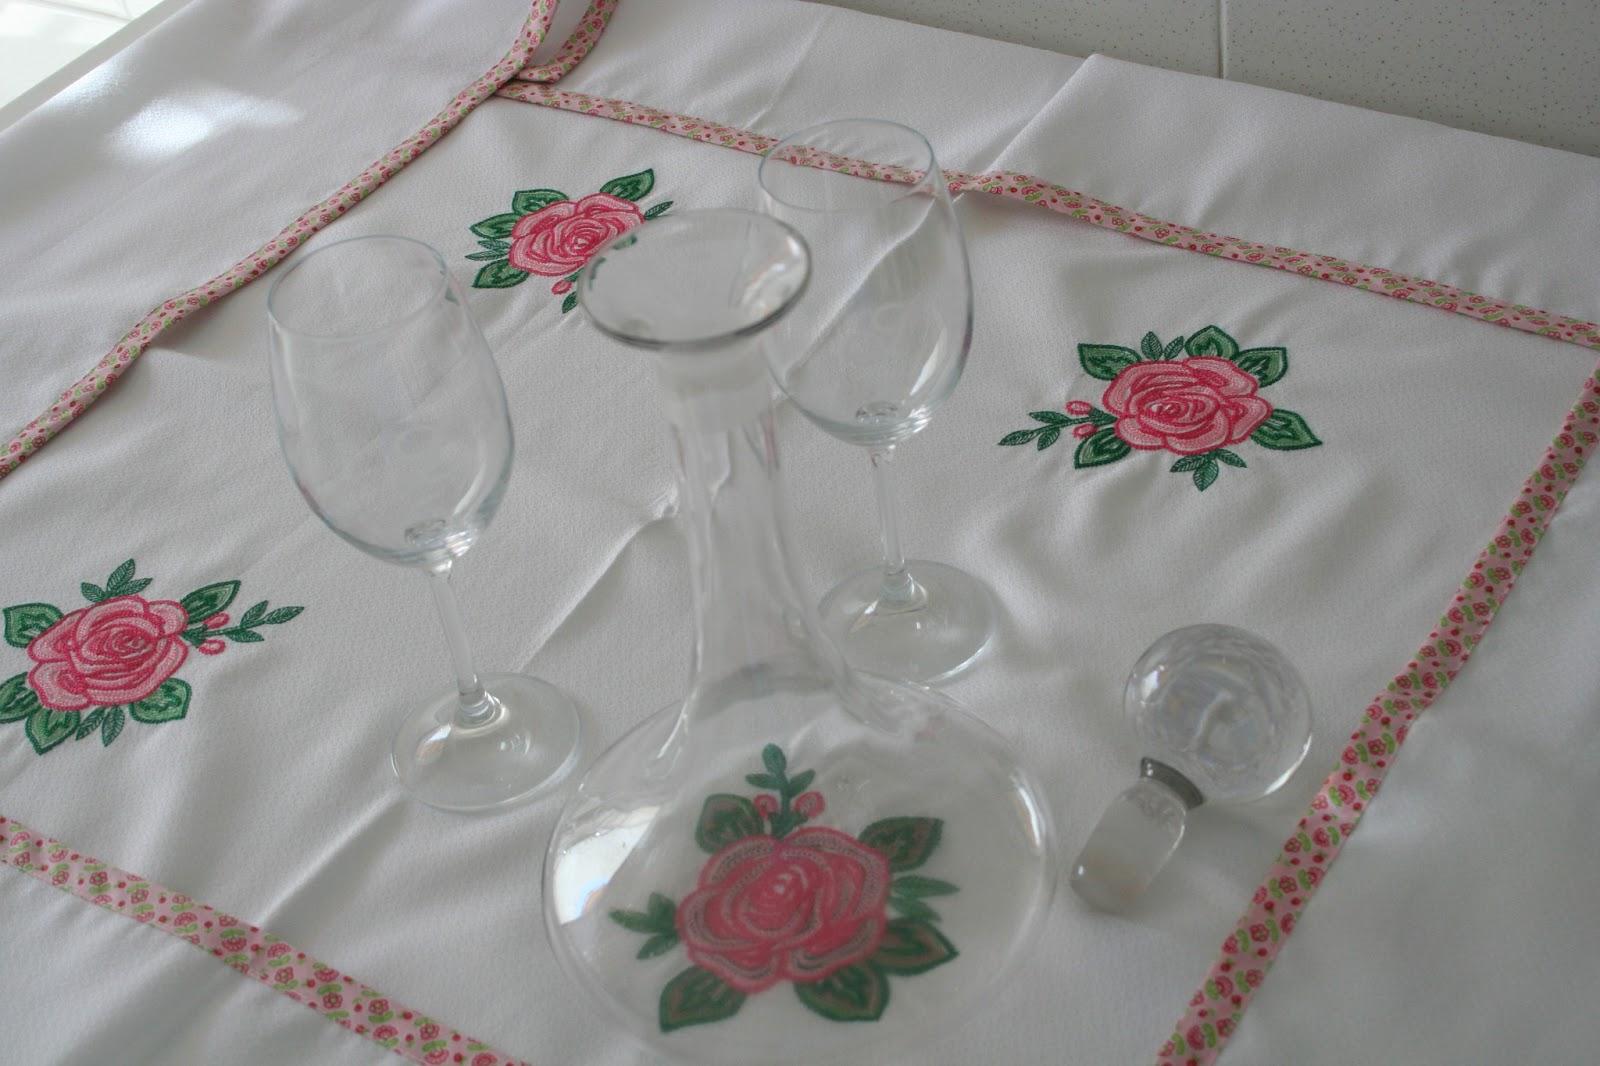 Manteles de mesa bordados manteles de mesa bordados - Manteles de mesa bordados ...